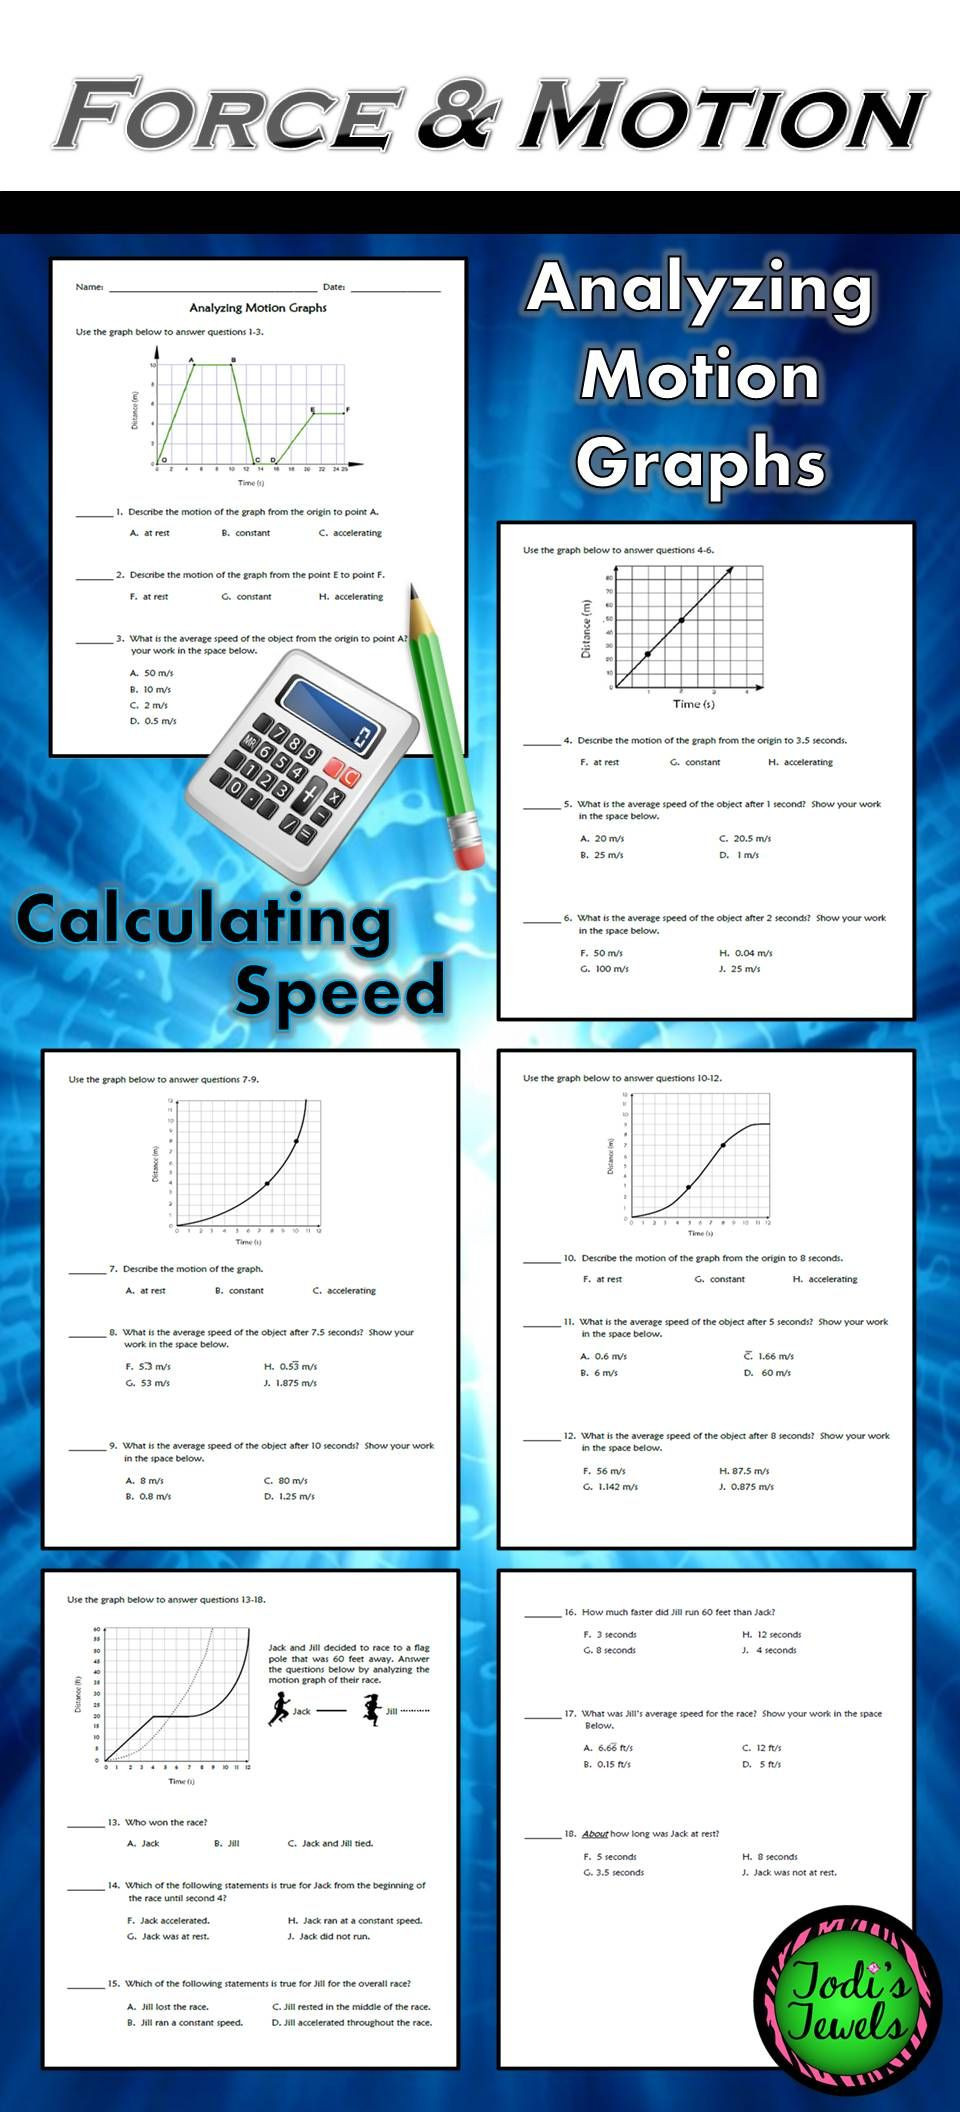 Motion Graph Analysis Worksheet Analyzing Motion Graphs & Calculating Speed Ws